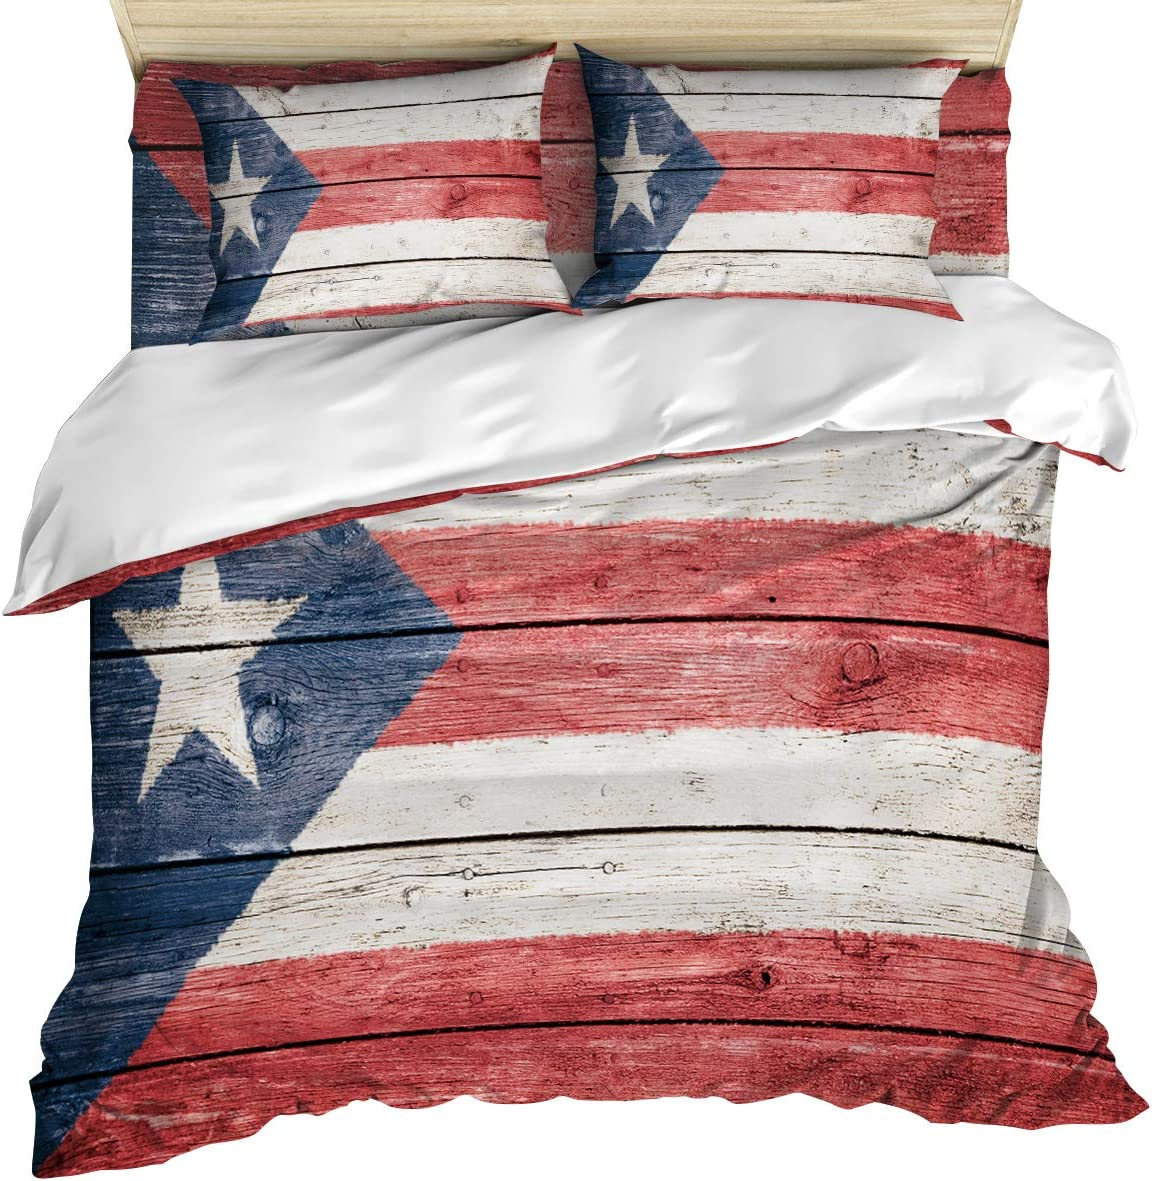 ZOE STORE Bedding Set Popular popular Includes 1 Sale SALE% OFF Sheet Pillo Duvet Cover 2 Bed